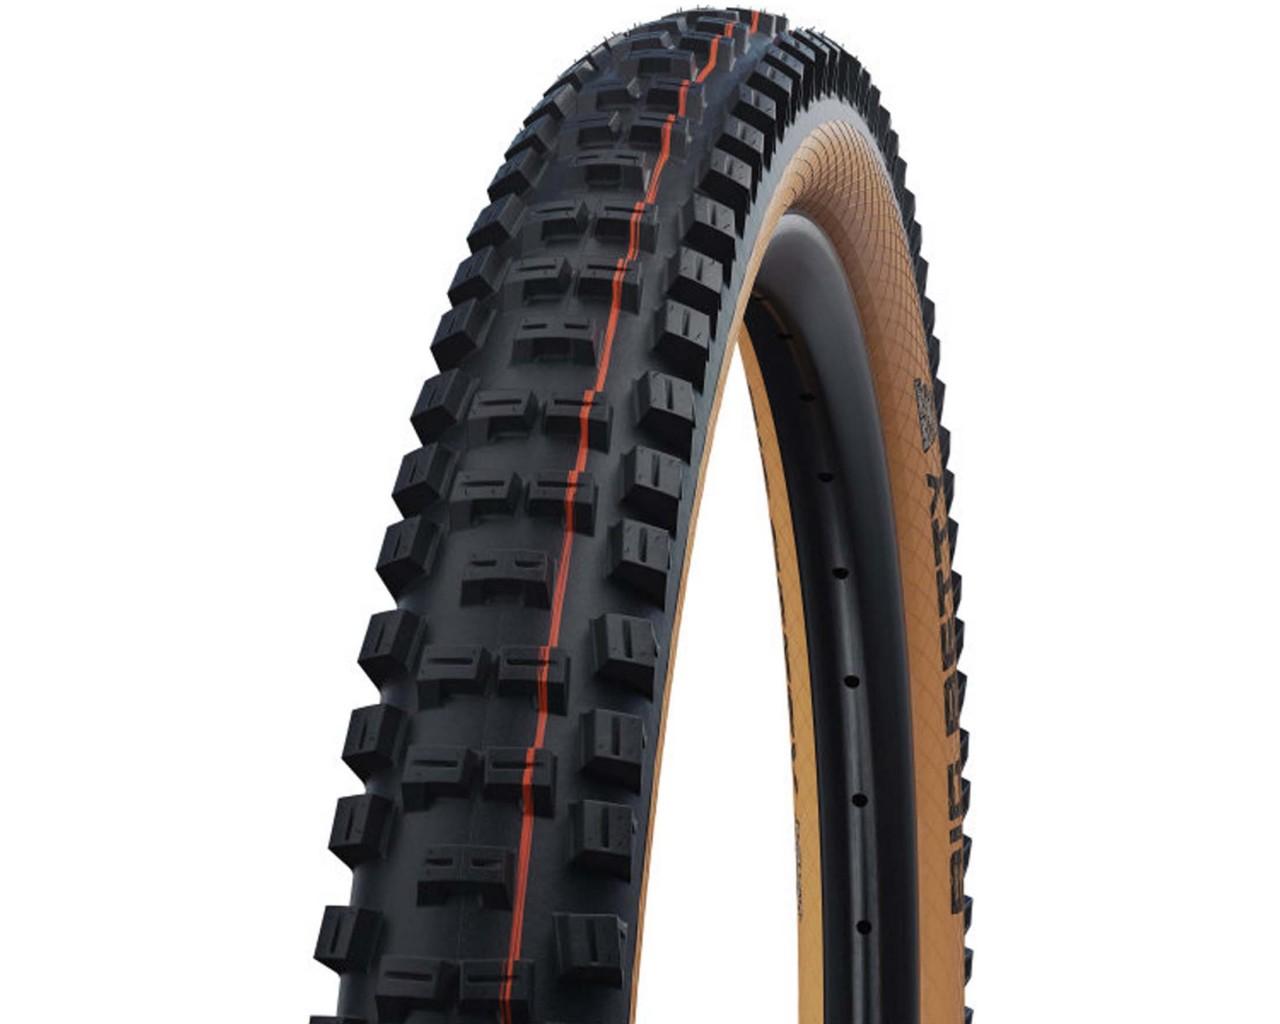 Schwalbe Big Betty MTB-tire 27.5x2.4 inch | black-classic ADDIX Soft Evolution Line foldable